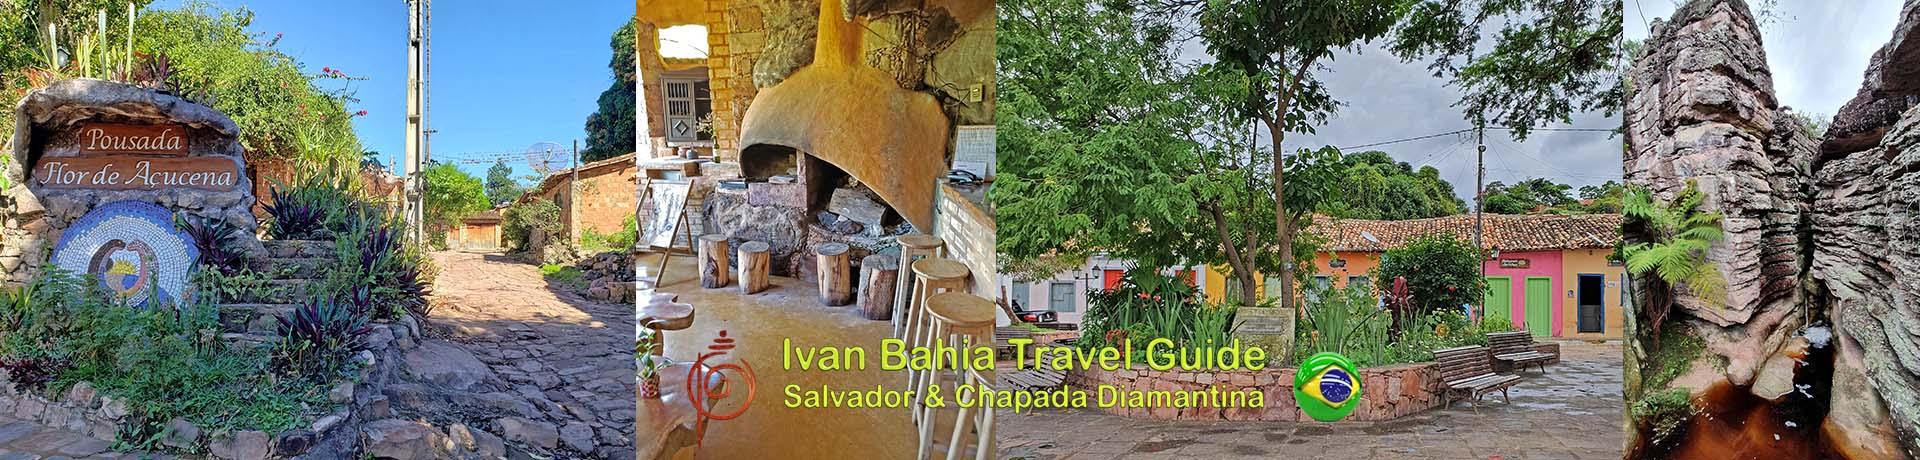 Ivan Bahia tour-guide /les meilleures ballades en  Chapada Diamantina Parc National (connu comme le 'Grand Canyon Brésilien') guide francophone vous montre les plus belles vues, Canto das Aguas Hotel / #ibtg #ibg #ivanbahiaguide #ivanbahiatravelguide #zenturturismo #ivanchapadadiamantinaguide #valedopati #patyvalley #pati #viapati #valecapao #ivanchapadaguide #chapadadiamantinatransfer #chapadatrekking #chapadaroots #chapadasoul #lencoisbahia #chapadadiamantinatrekking #ivanchapadadiamantinaguide  #chapadadiamantinaguide  #guidechapadadiamantina #lencois #lençois #chapadaadventuredaniel #diamondmountains #zentur # #guiachapadadiamantina #chapadaaventure #discoverchapada #chapadadiamond #chapadasoul #diamantinatrip  #tripadvisor #bahiametisse, #fernandobingre, #ivansalvadorbahia #salvadorbahiaTravel #toursbylocals #fotosbahia #bahiafotos #chapadadiamantinanationalpark #yourtoursbrazil #maurotours #bahiatopturismo #bahiapremium #maisbahiaturismo #fernandobingretourguide #cassiturismo